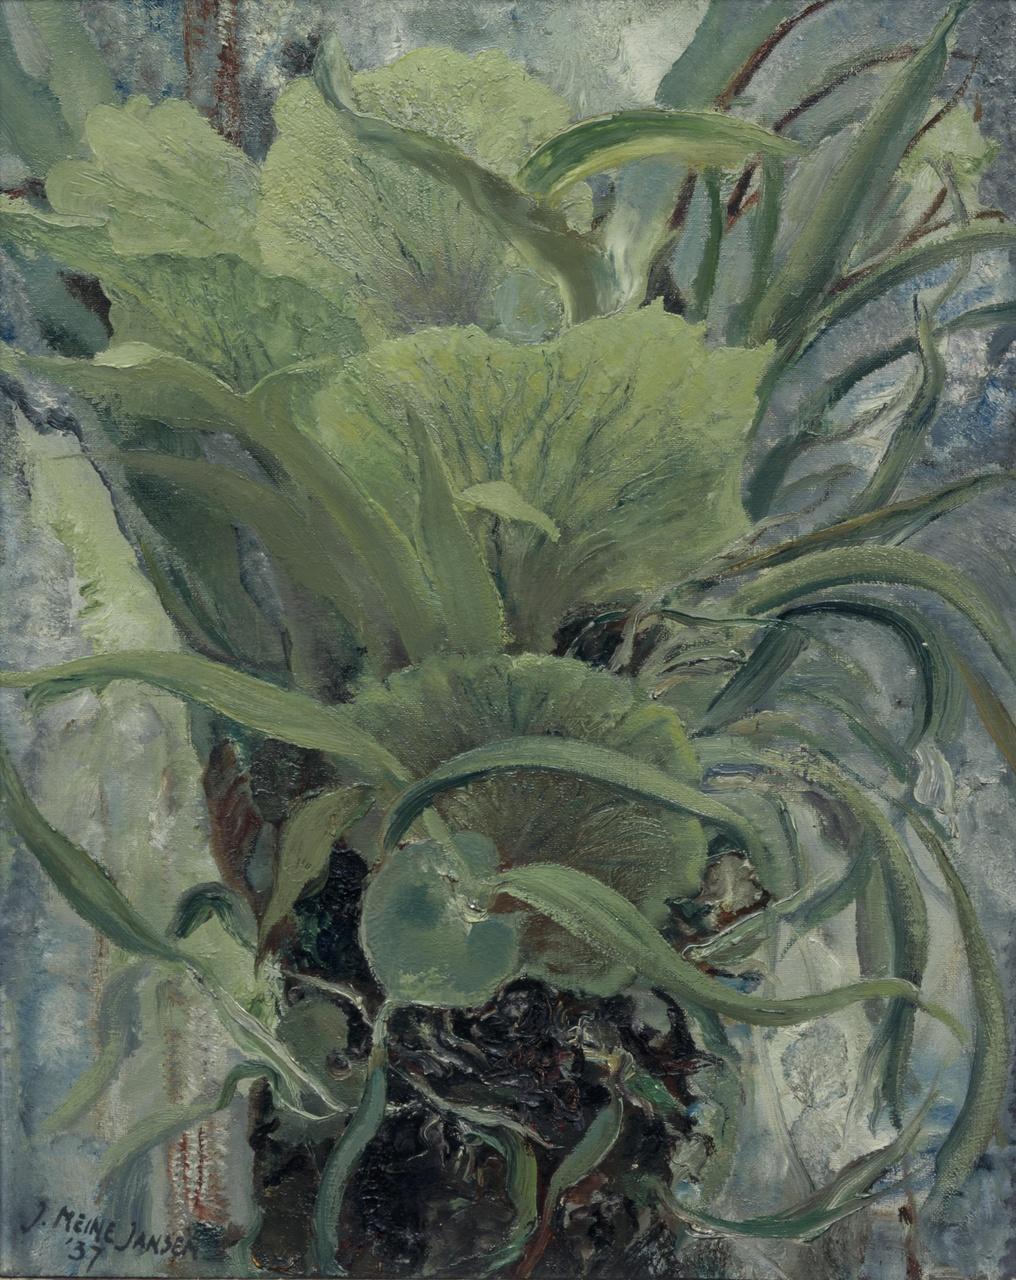 Hertshoornplant